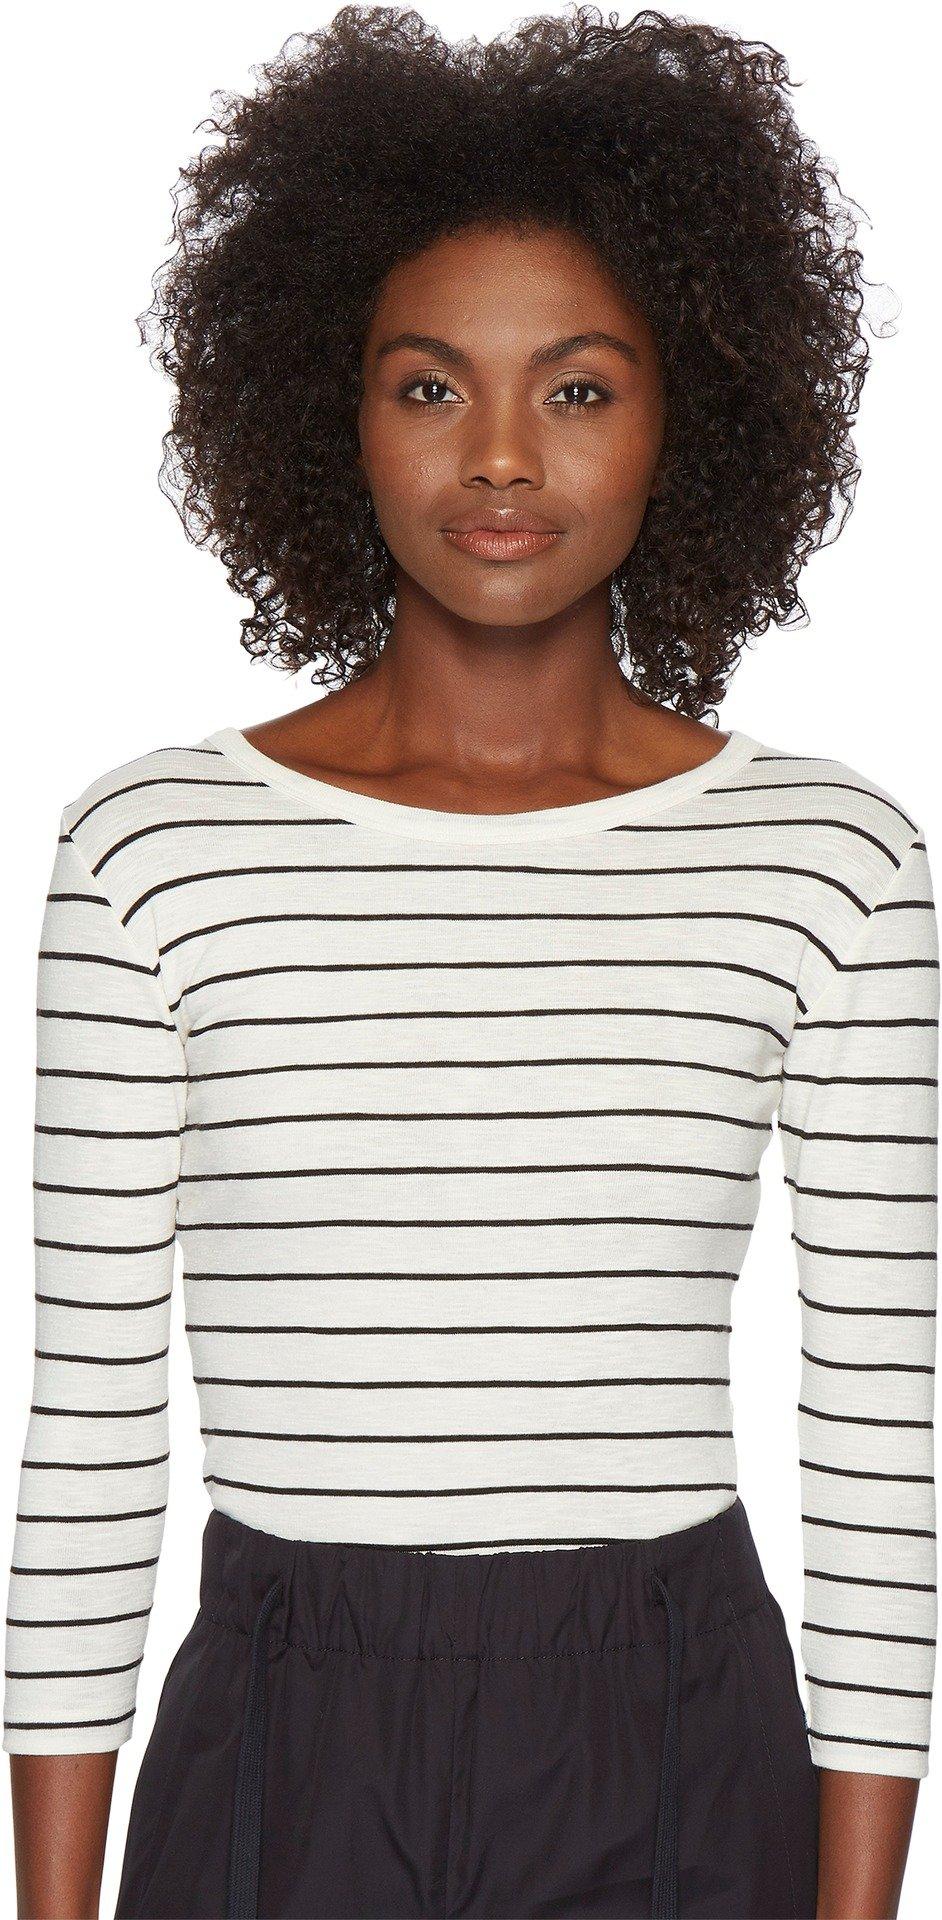 Vince Women's Chalk Stripe 3/4 Sleeve Crew Top Off-White/Black Small